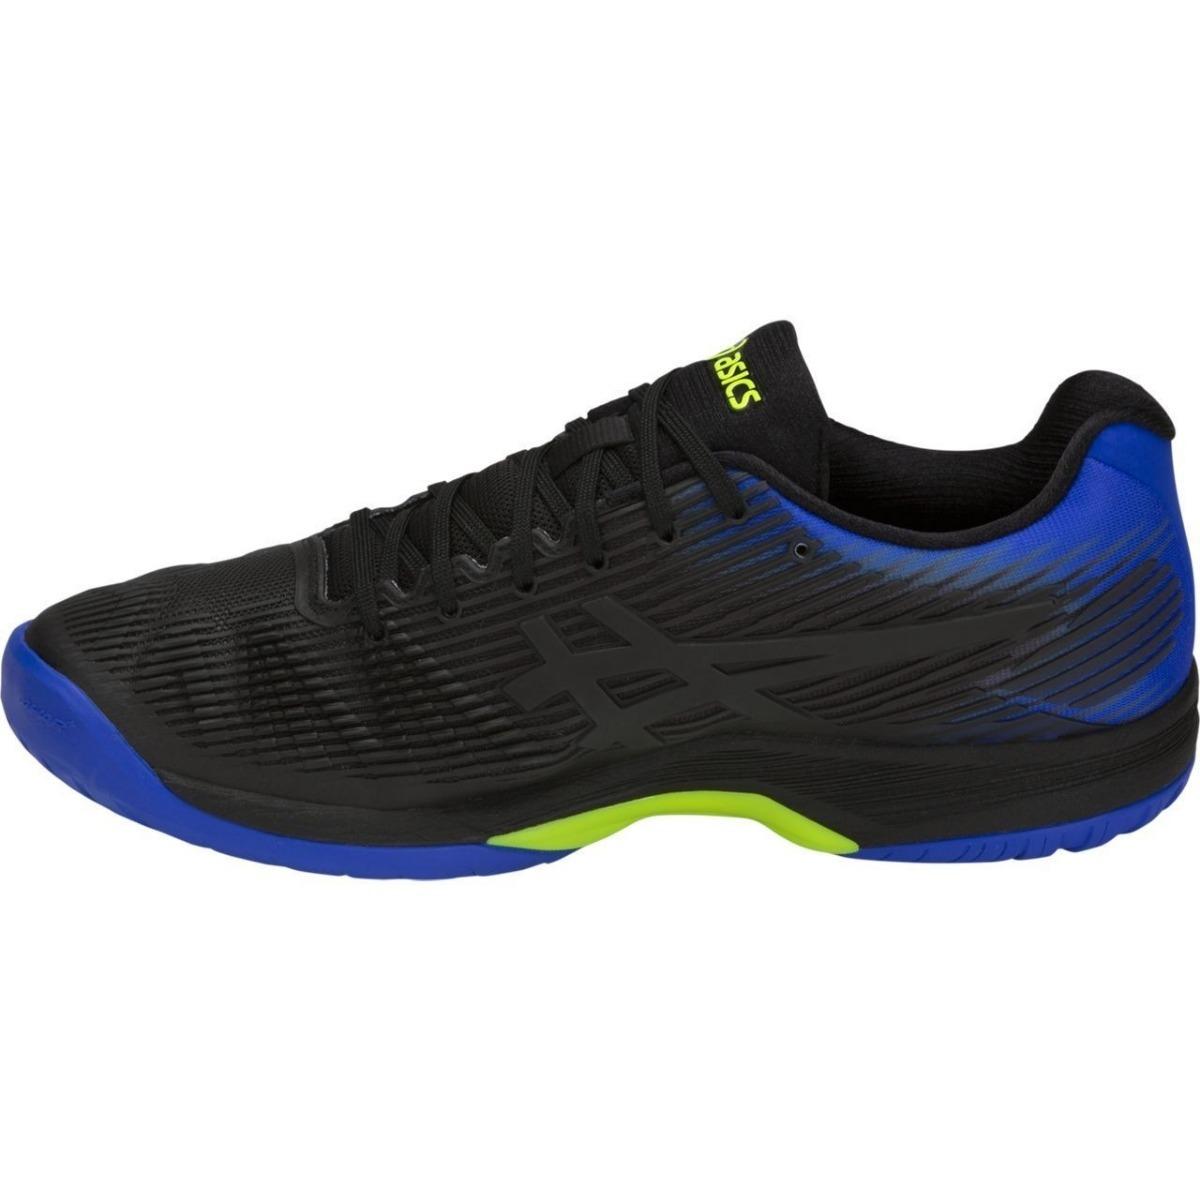 2c328fce0 Tênis Asics Gel Solution Speed Ff Tennis